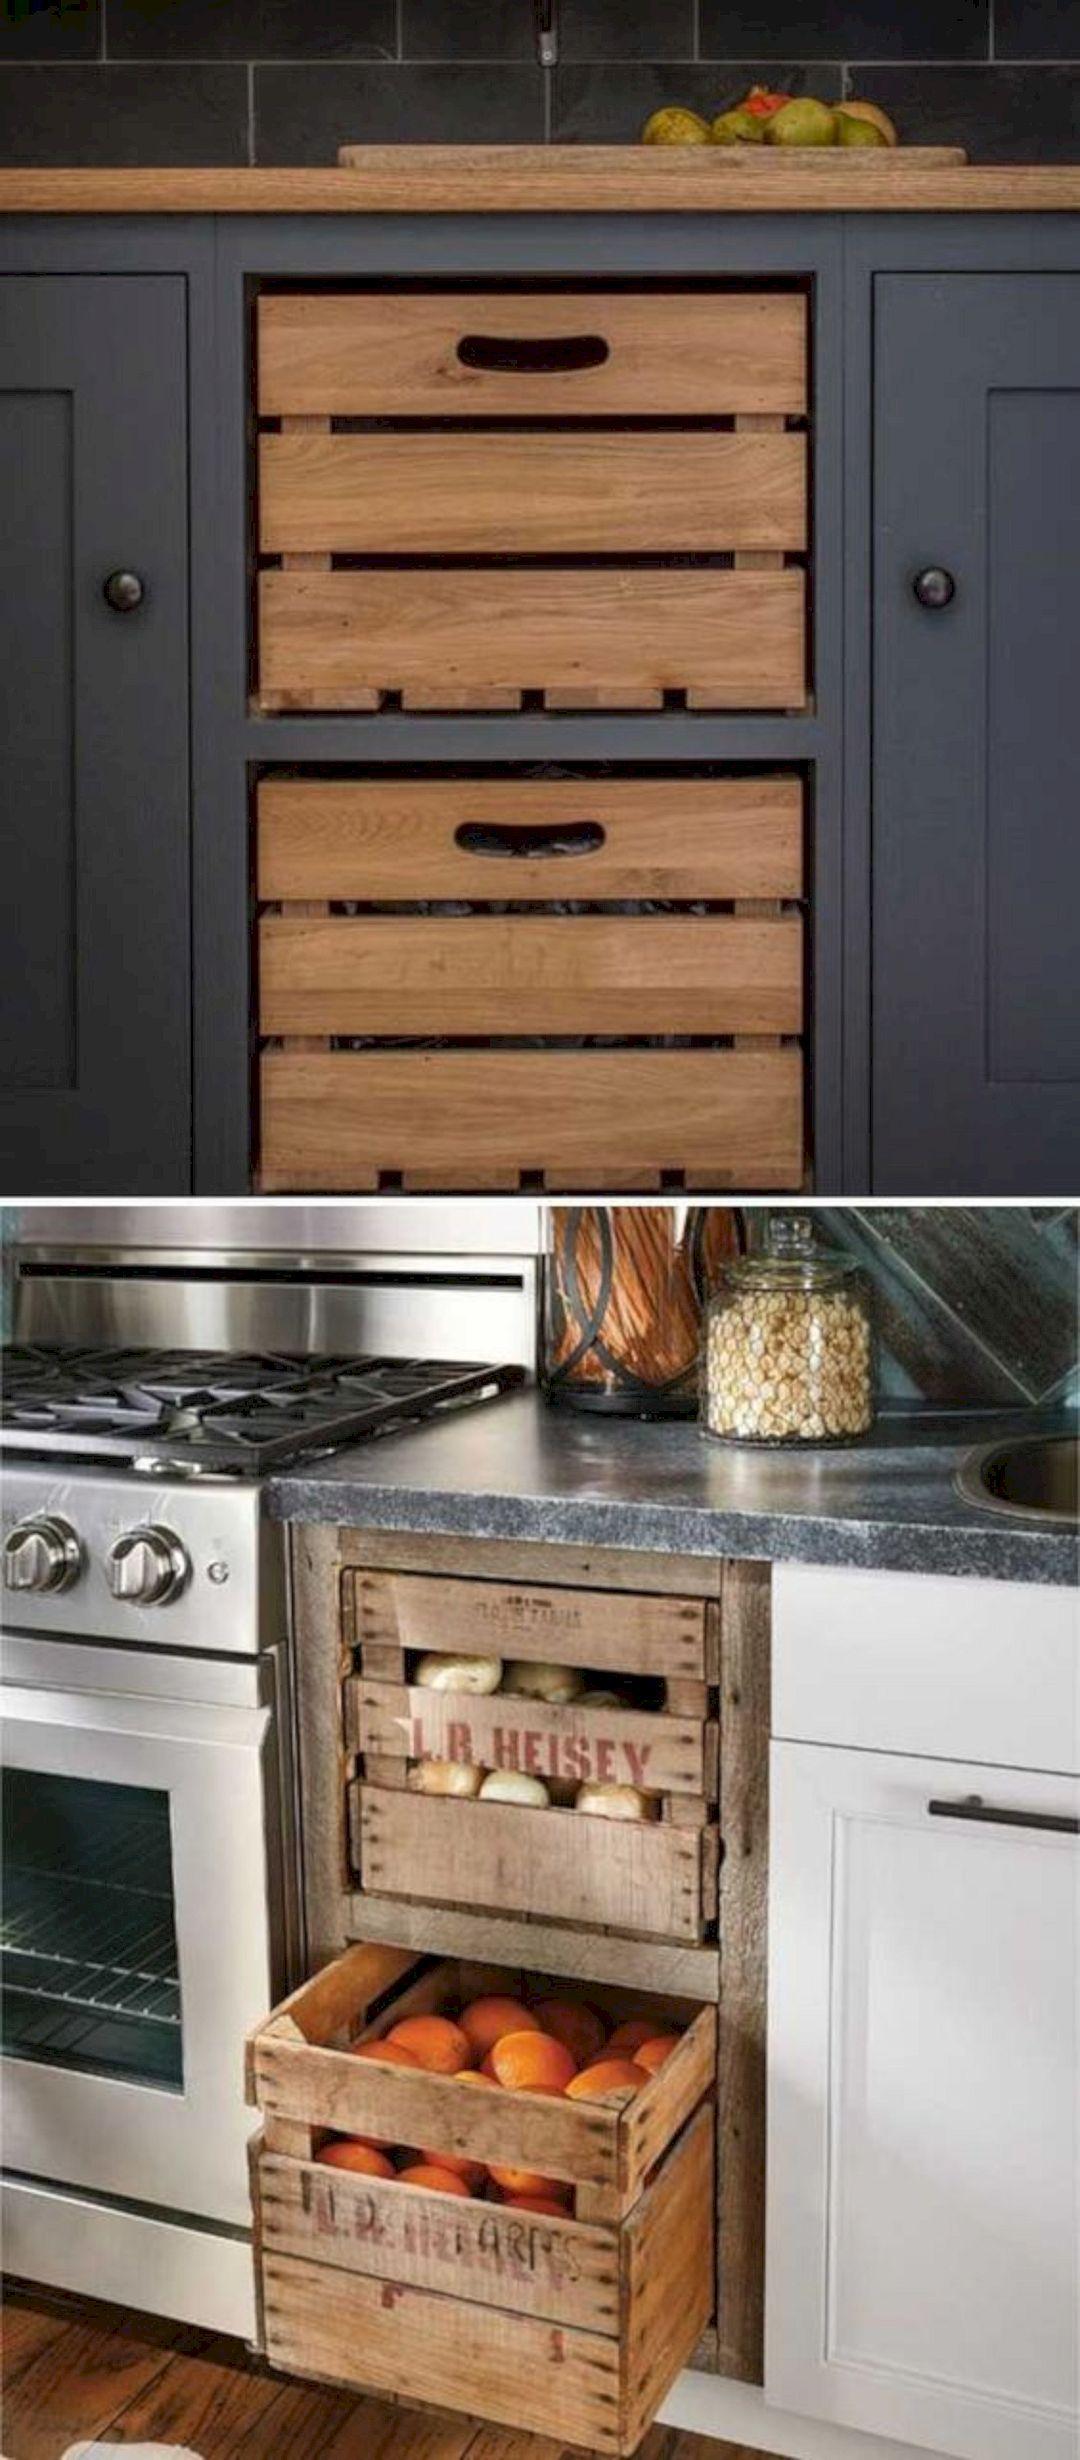 16 Nice Farmhouse Decorating Ideas Kitchen Decor Kitchen Remodel Rustic Kitchen